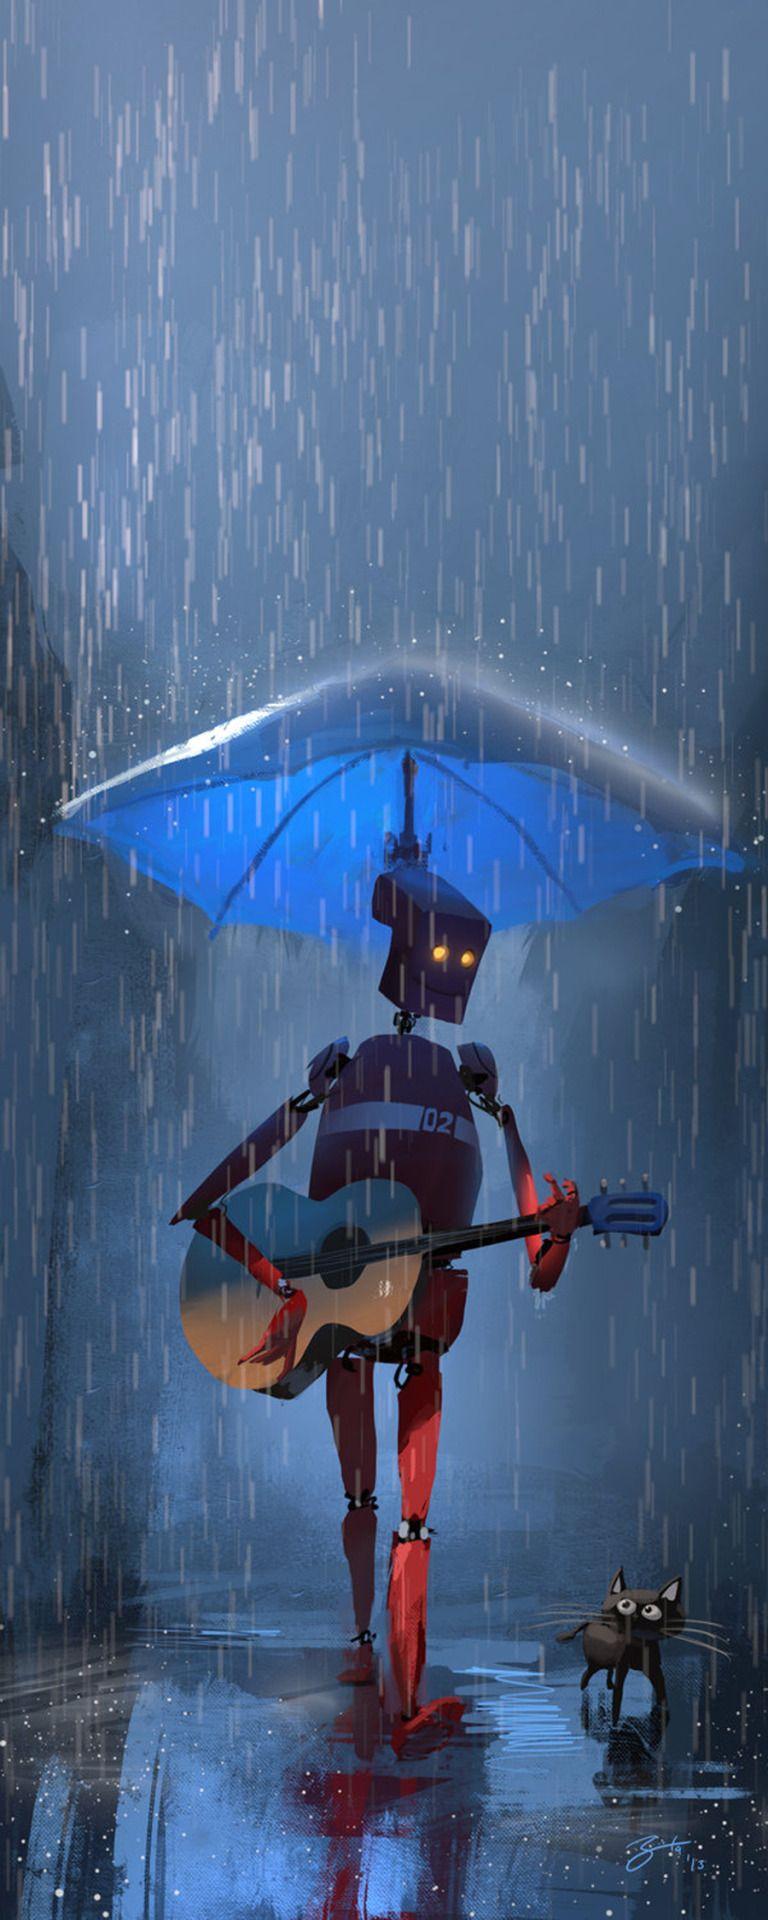 The Art Of Animation, Goro Fujita | For Allie | Pinterest ...